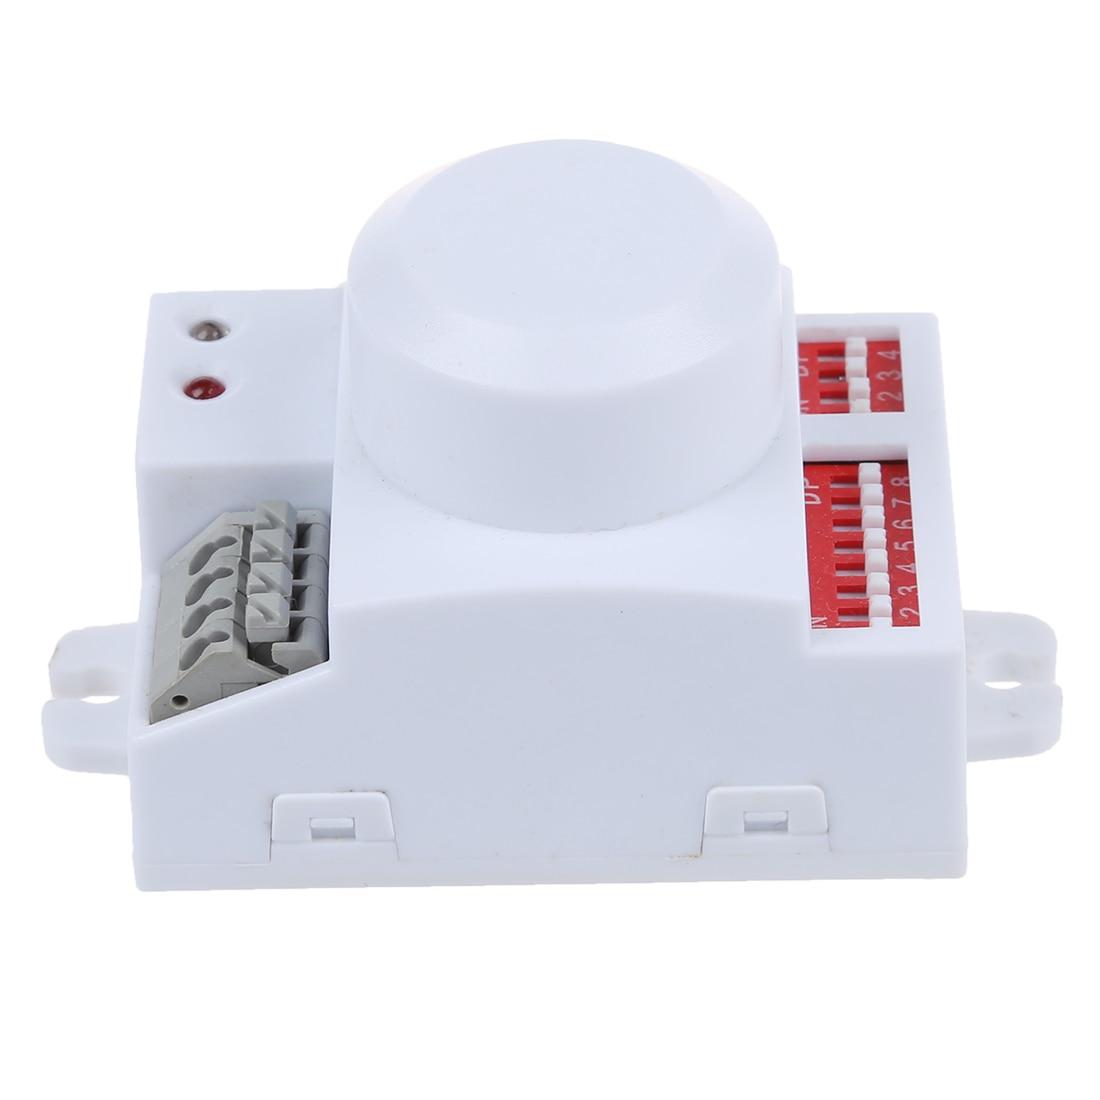 все цены на Microwave motion sensor switch Doppler Radar Wireless Module for lighting 220V - White онлайн